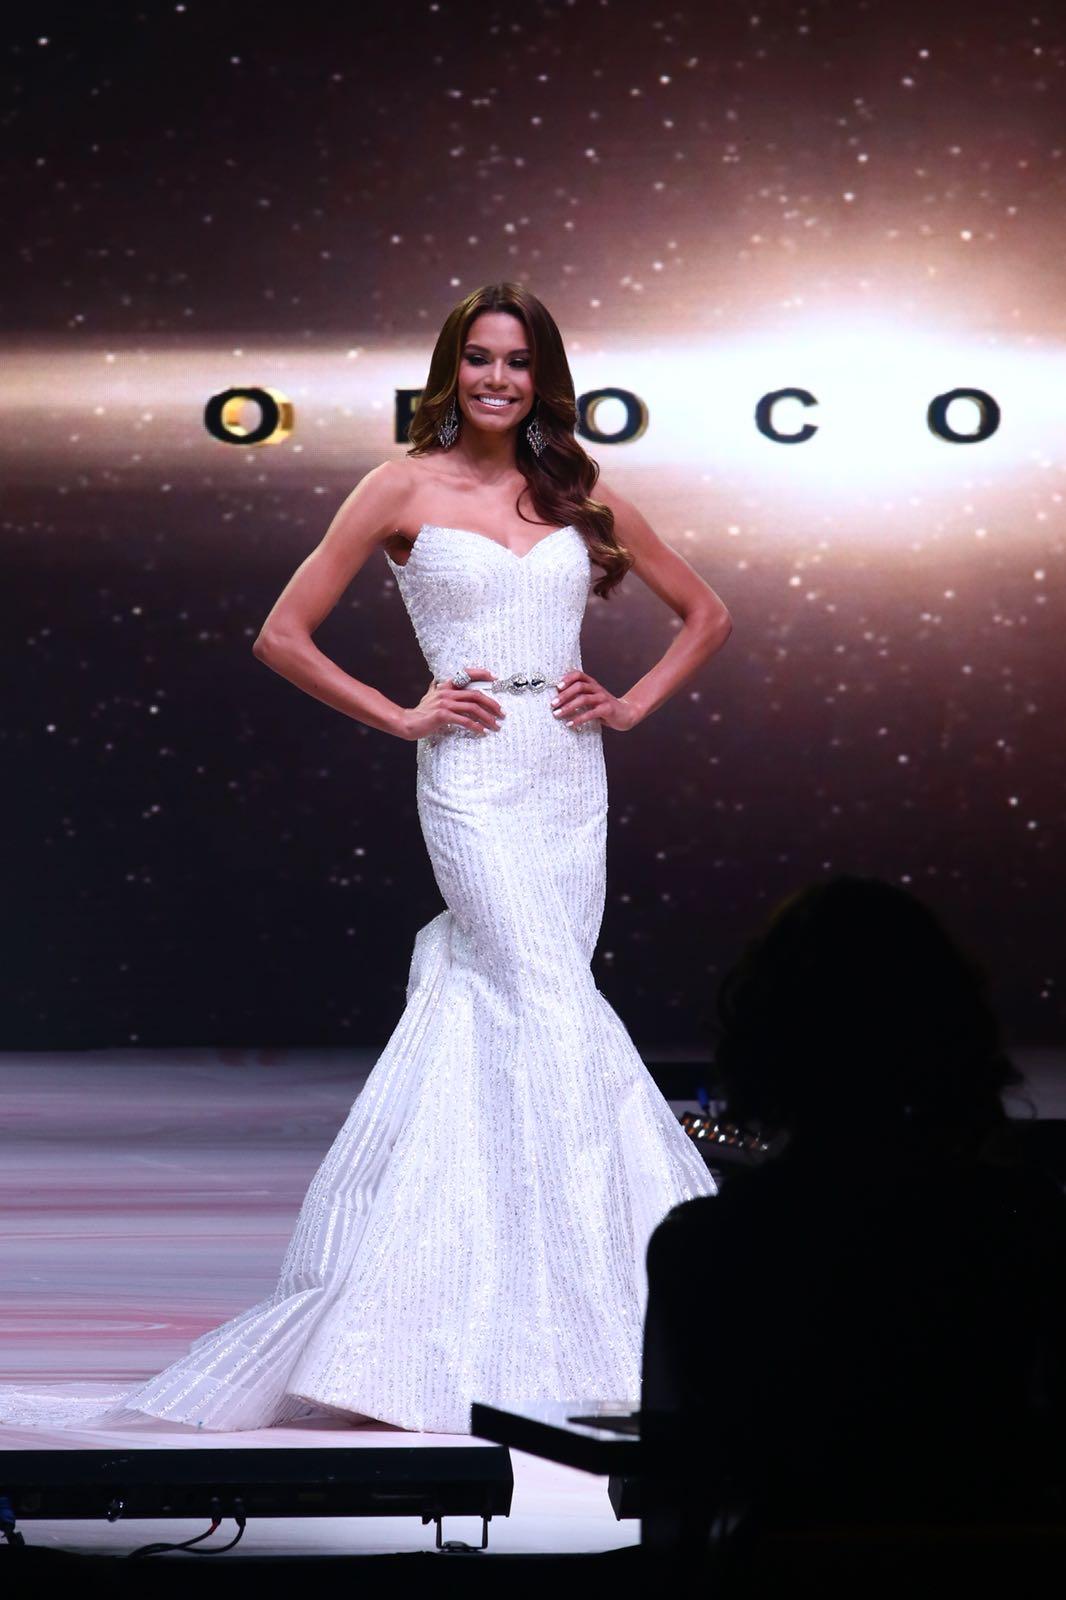 mayde columna, miss orocovis universe 2018/miss intercontinental 2010. - Página 3 20180913